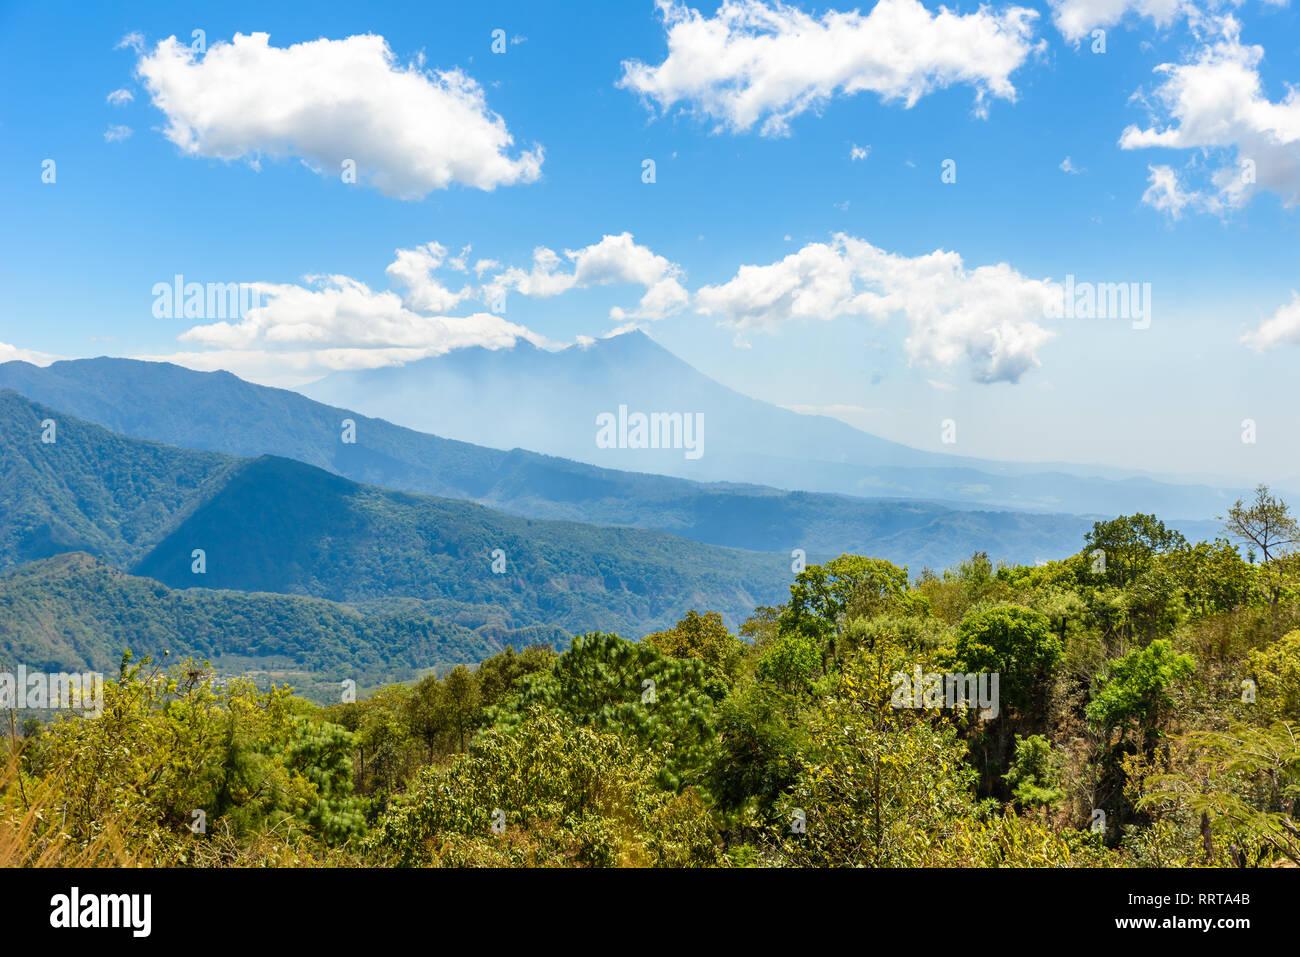 Volcano Scenery Landscape around lake Atitlan in the Highlands of Guatemala - Stock Image